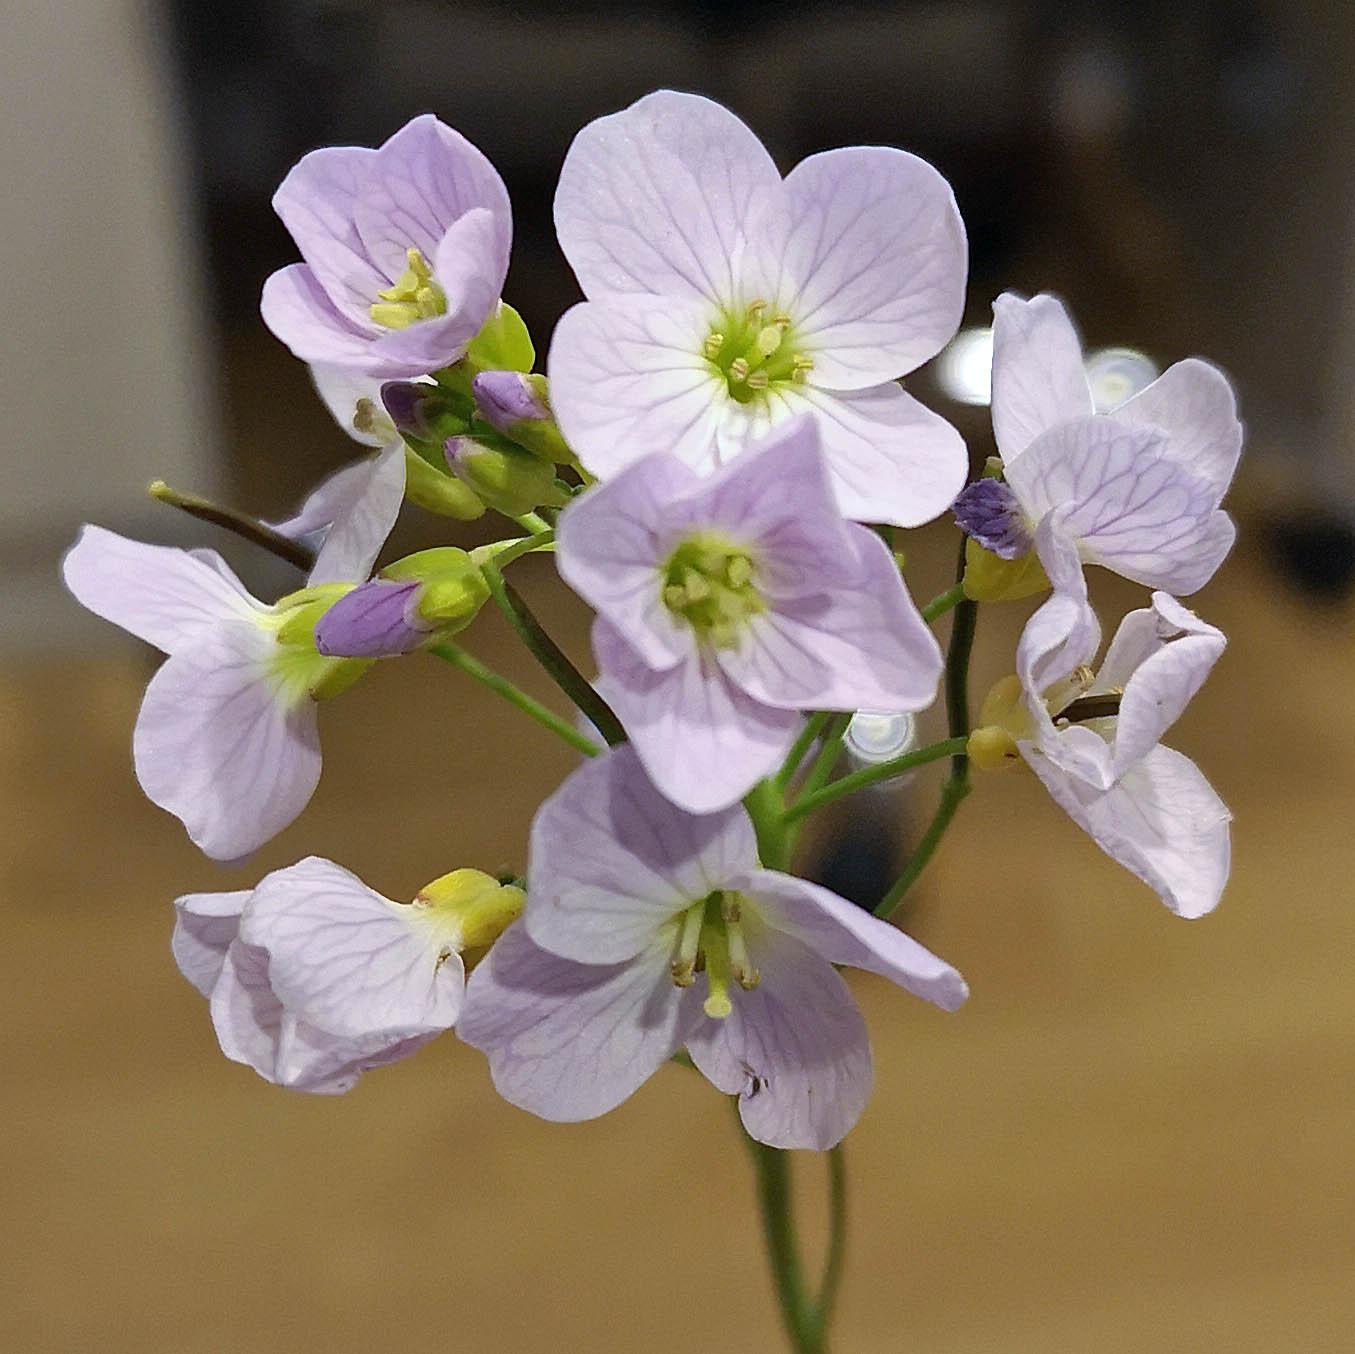 Cuckoo Flower - Cardamine